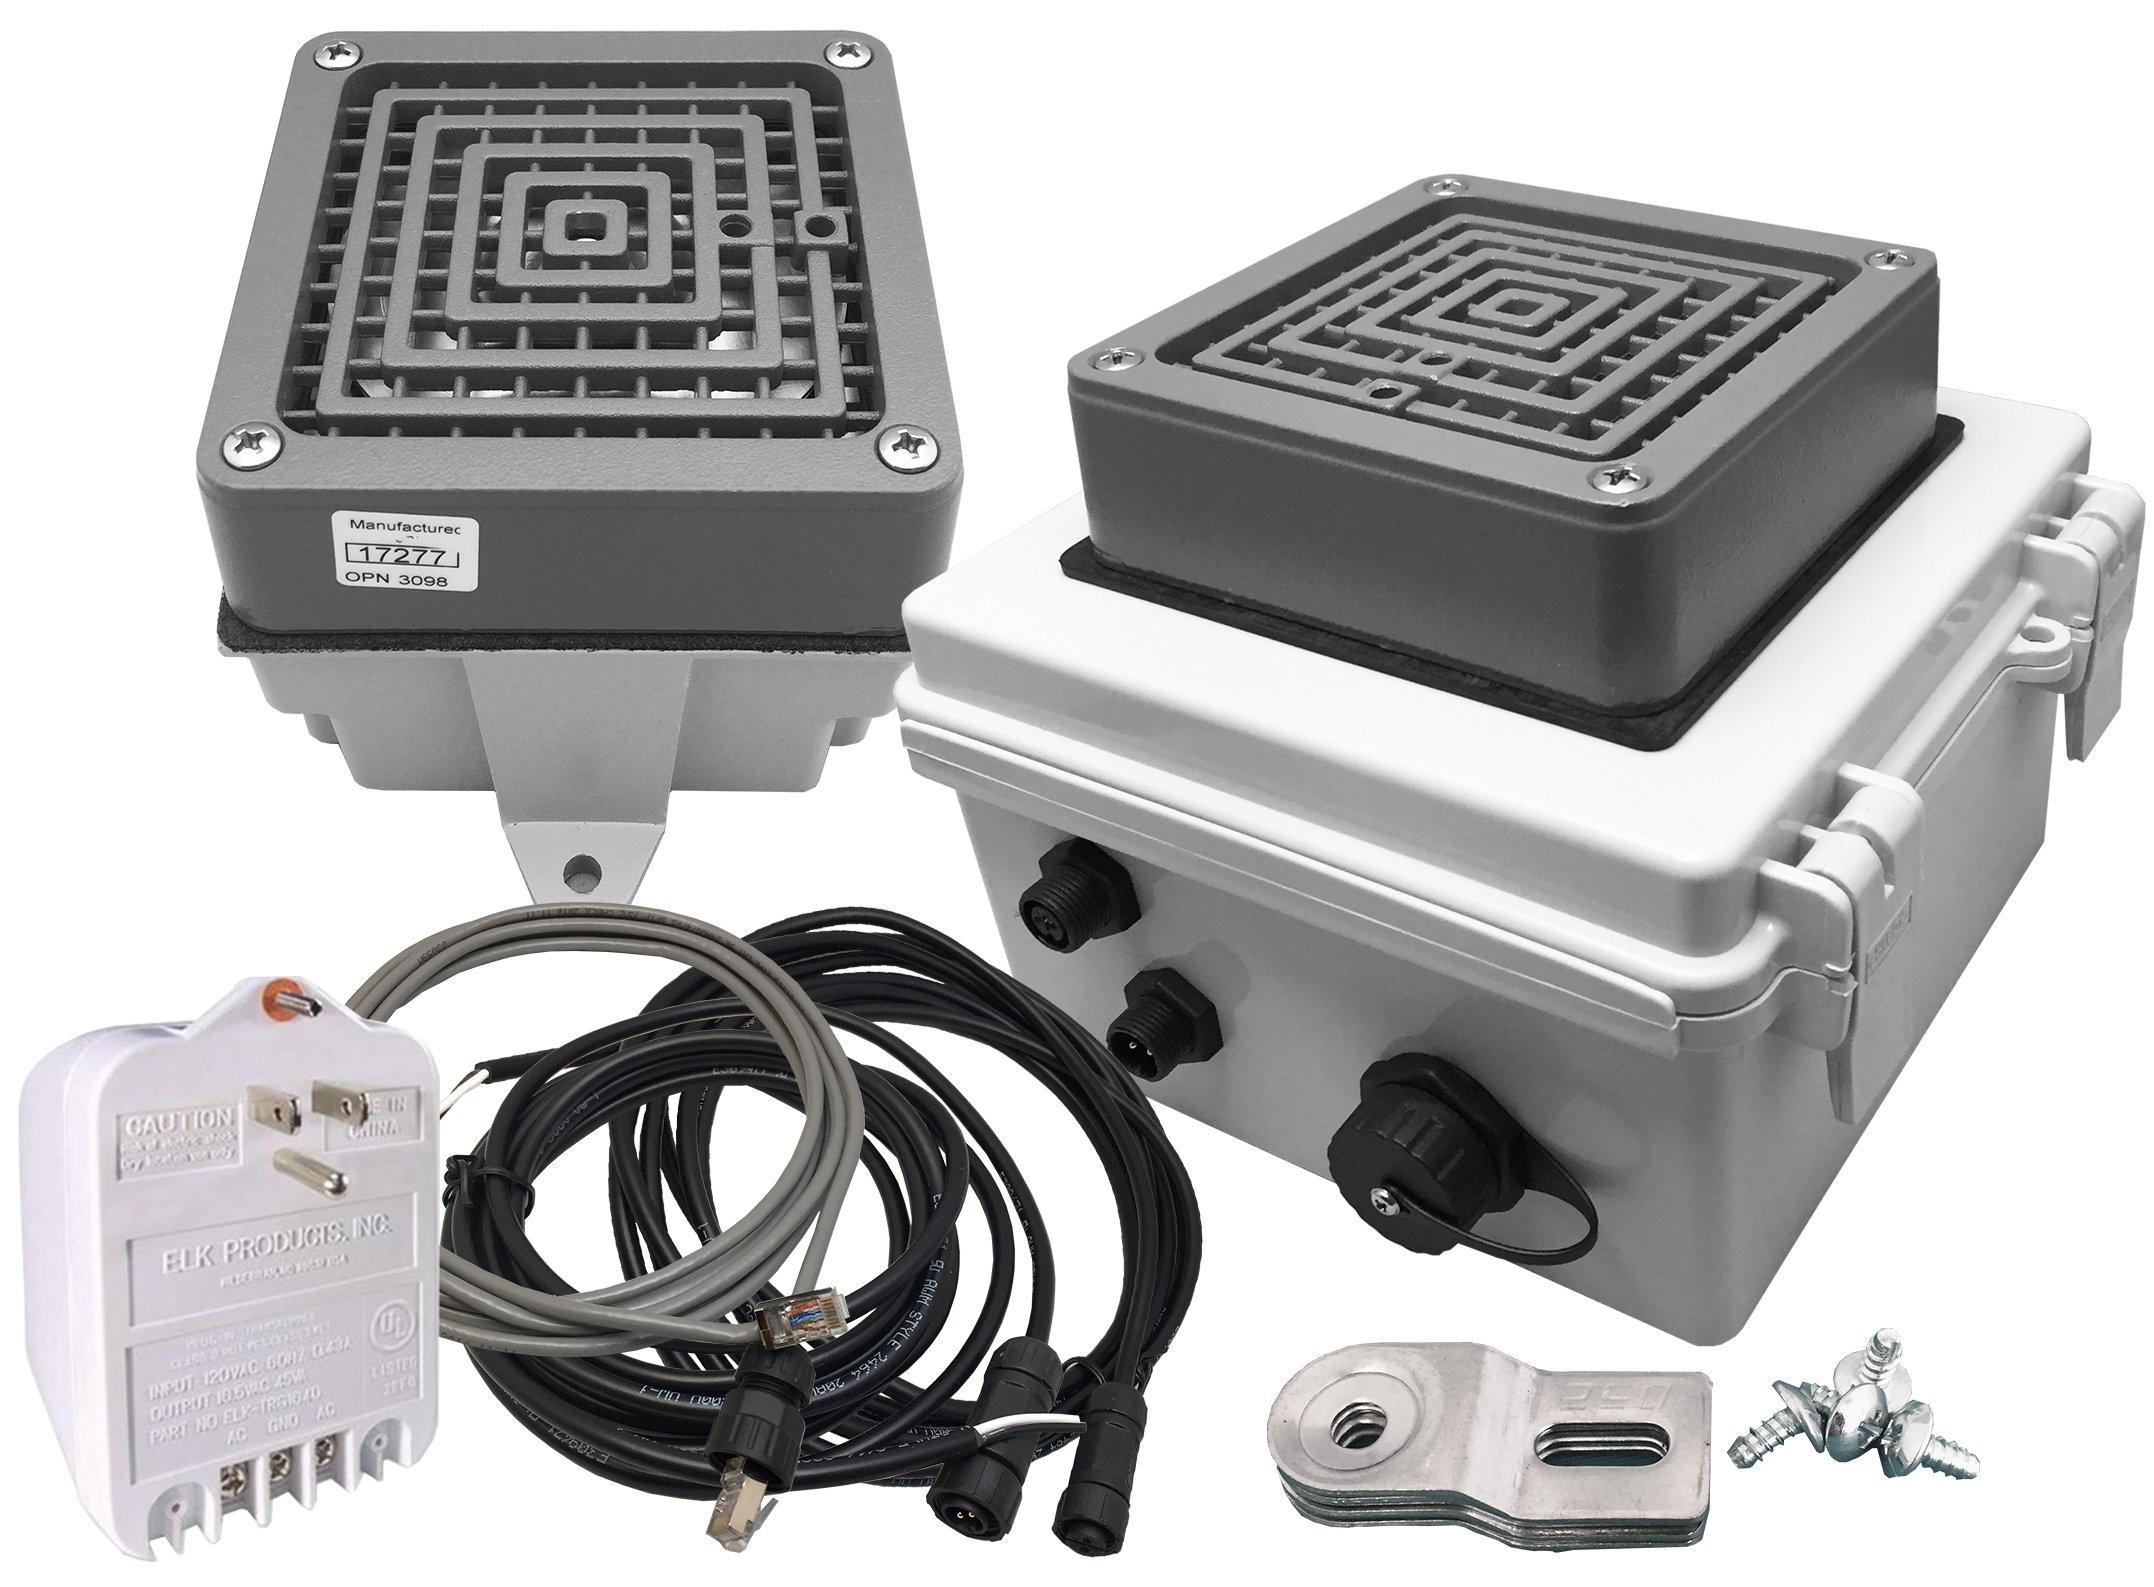 Linortek Netbell-KB-E1 Network Extra Loud Automatic Factory Warehouse  Industrial Break Bell System Programmable Timer Controller w/ 1 External  Buzzer